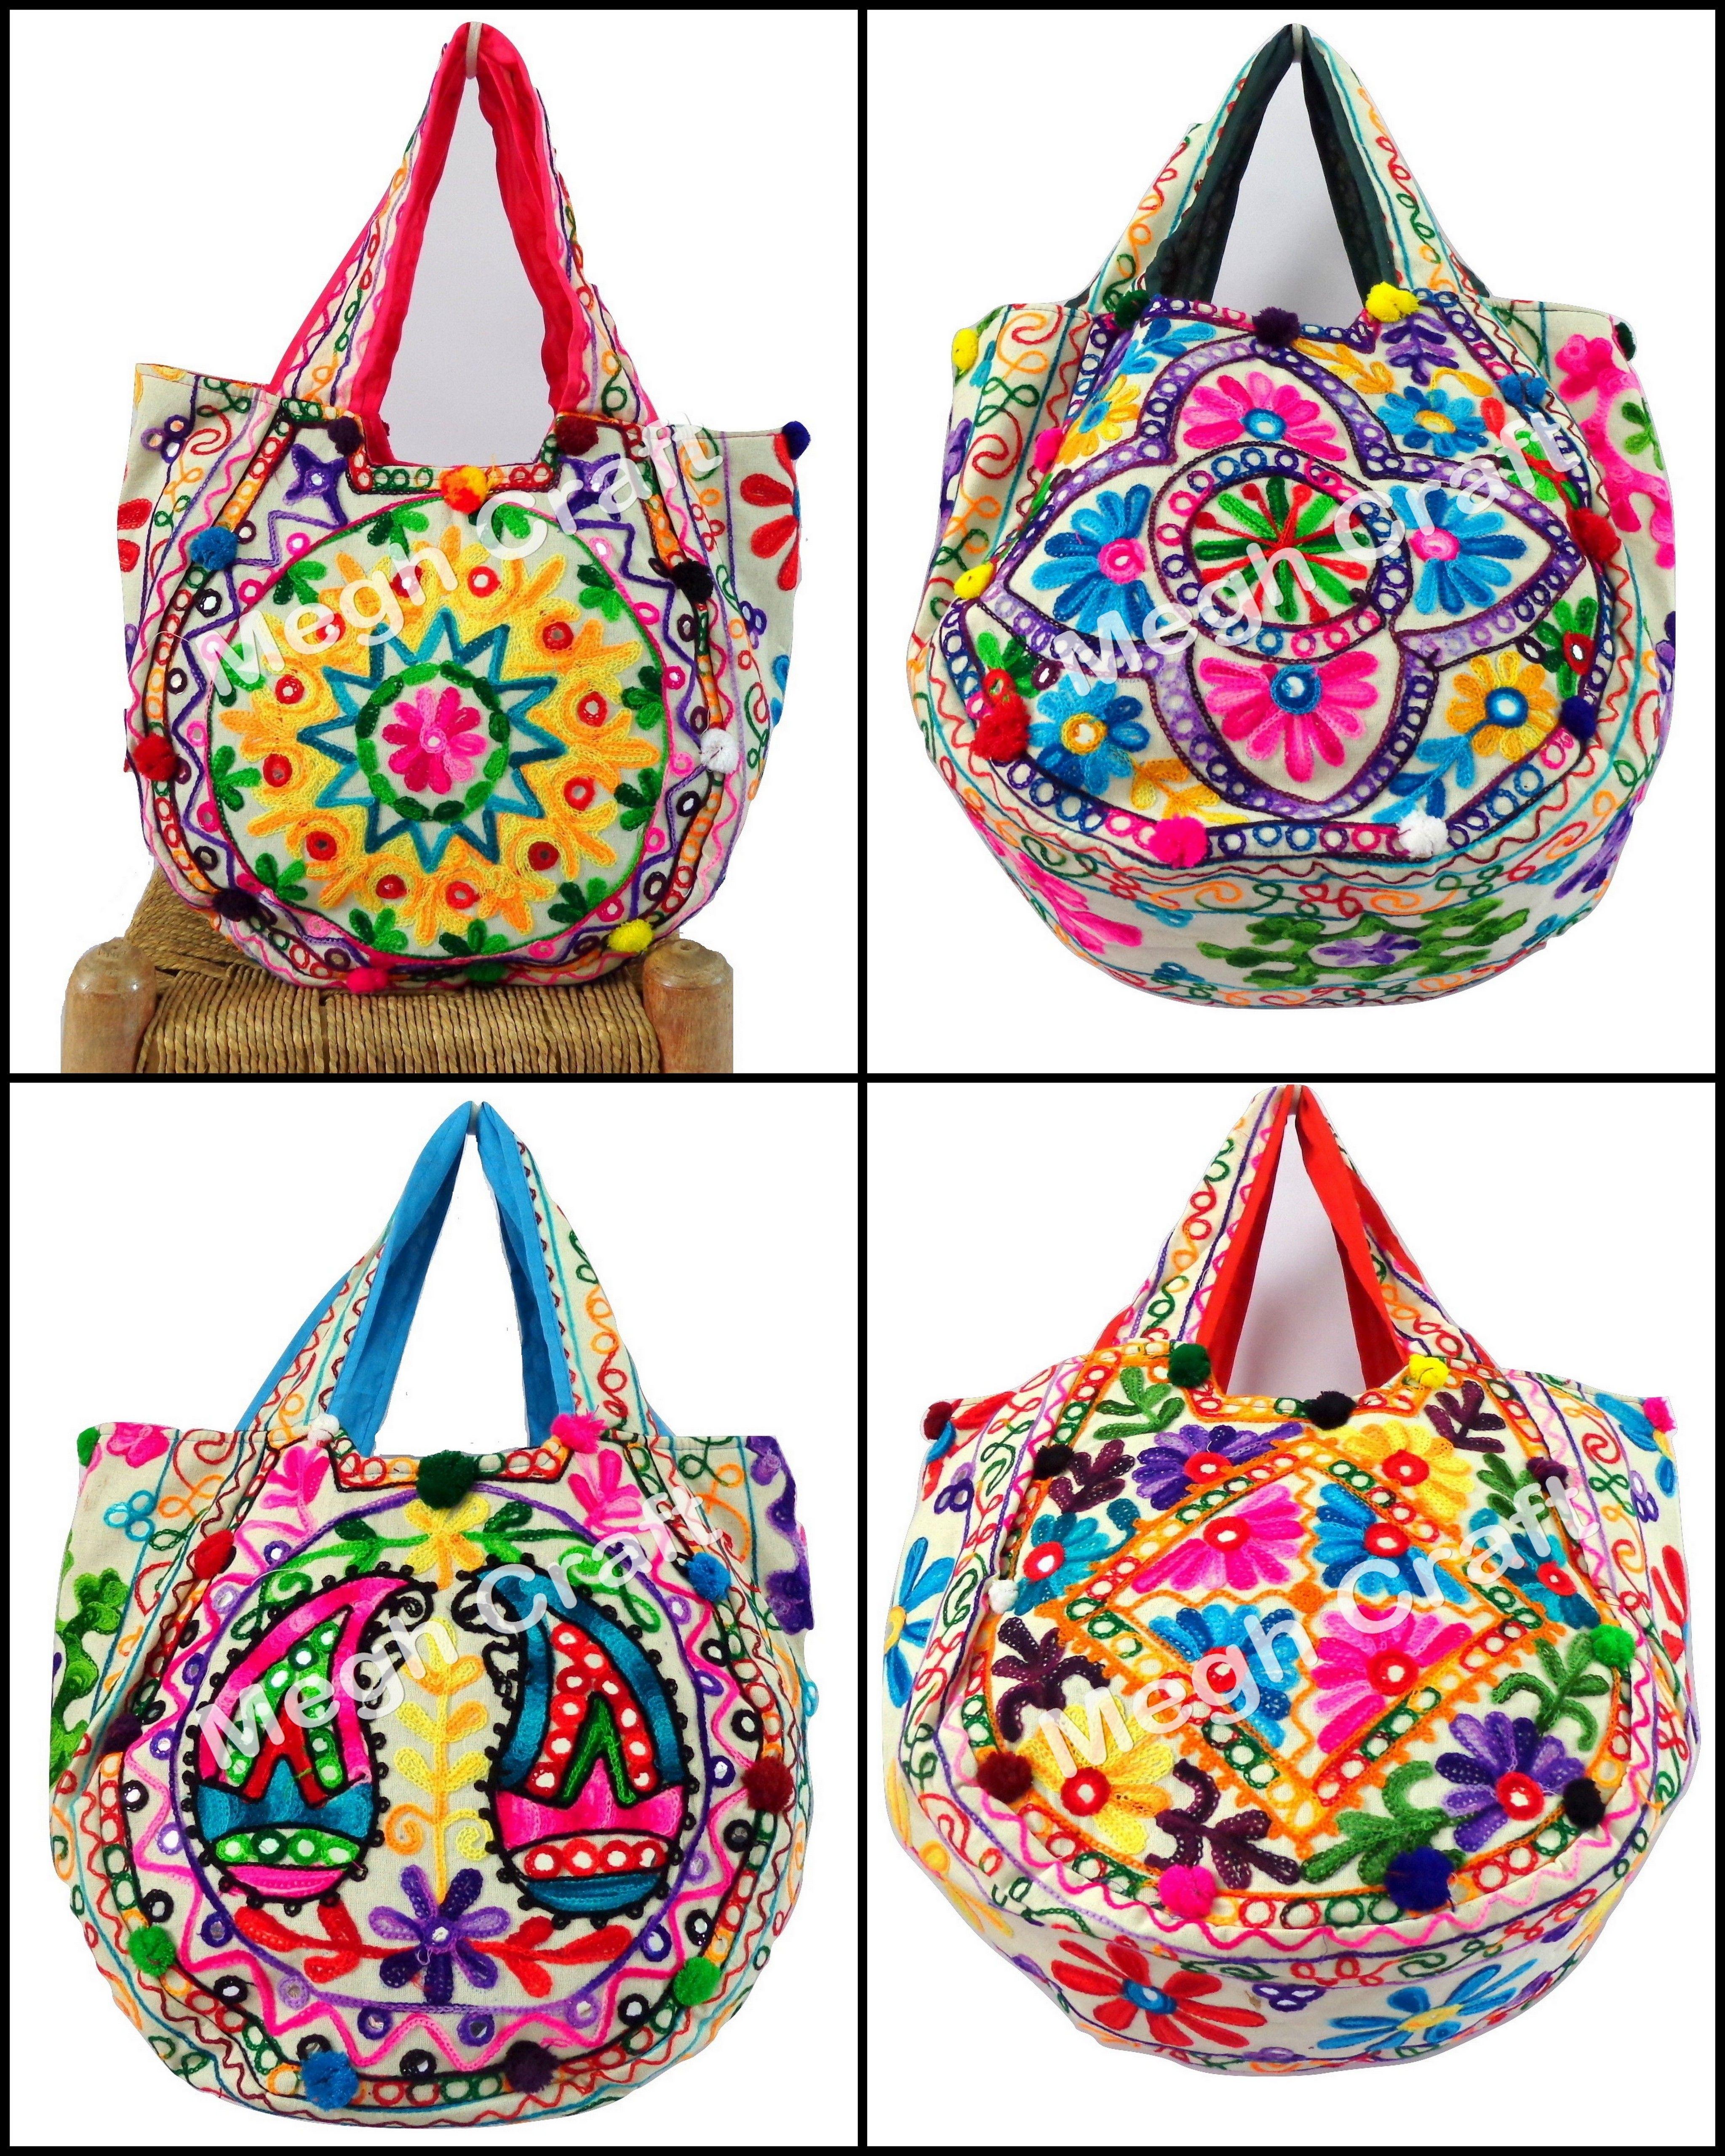 d4ca1ed152 Vintage banjara beach handbag - Women handmade kutch embroidered tote bag -  Bohemian vintage lover mirror